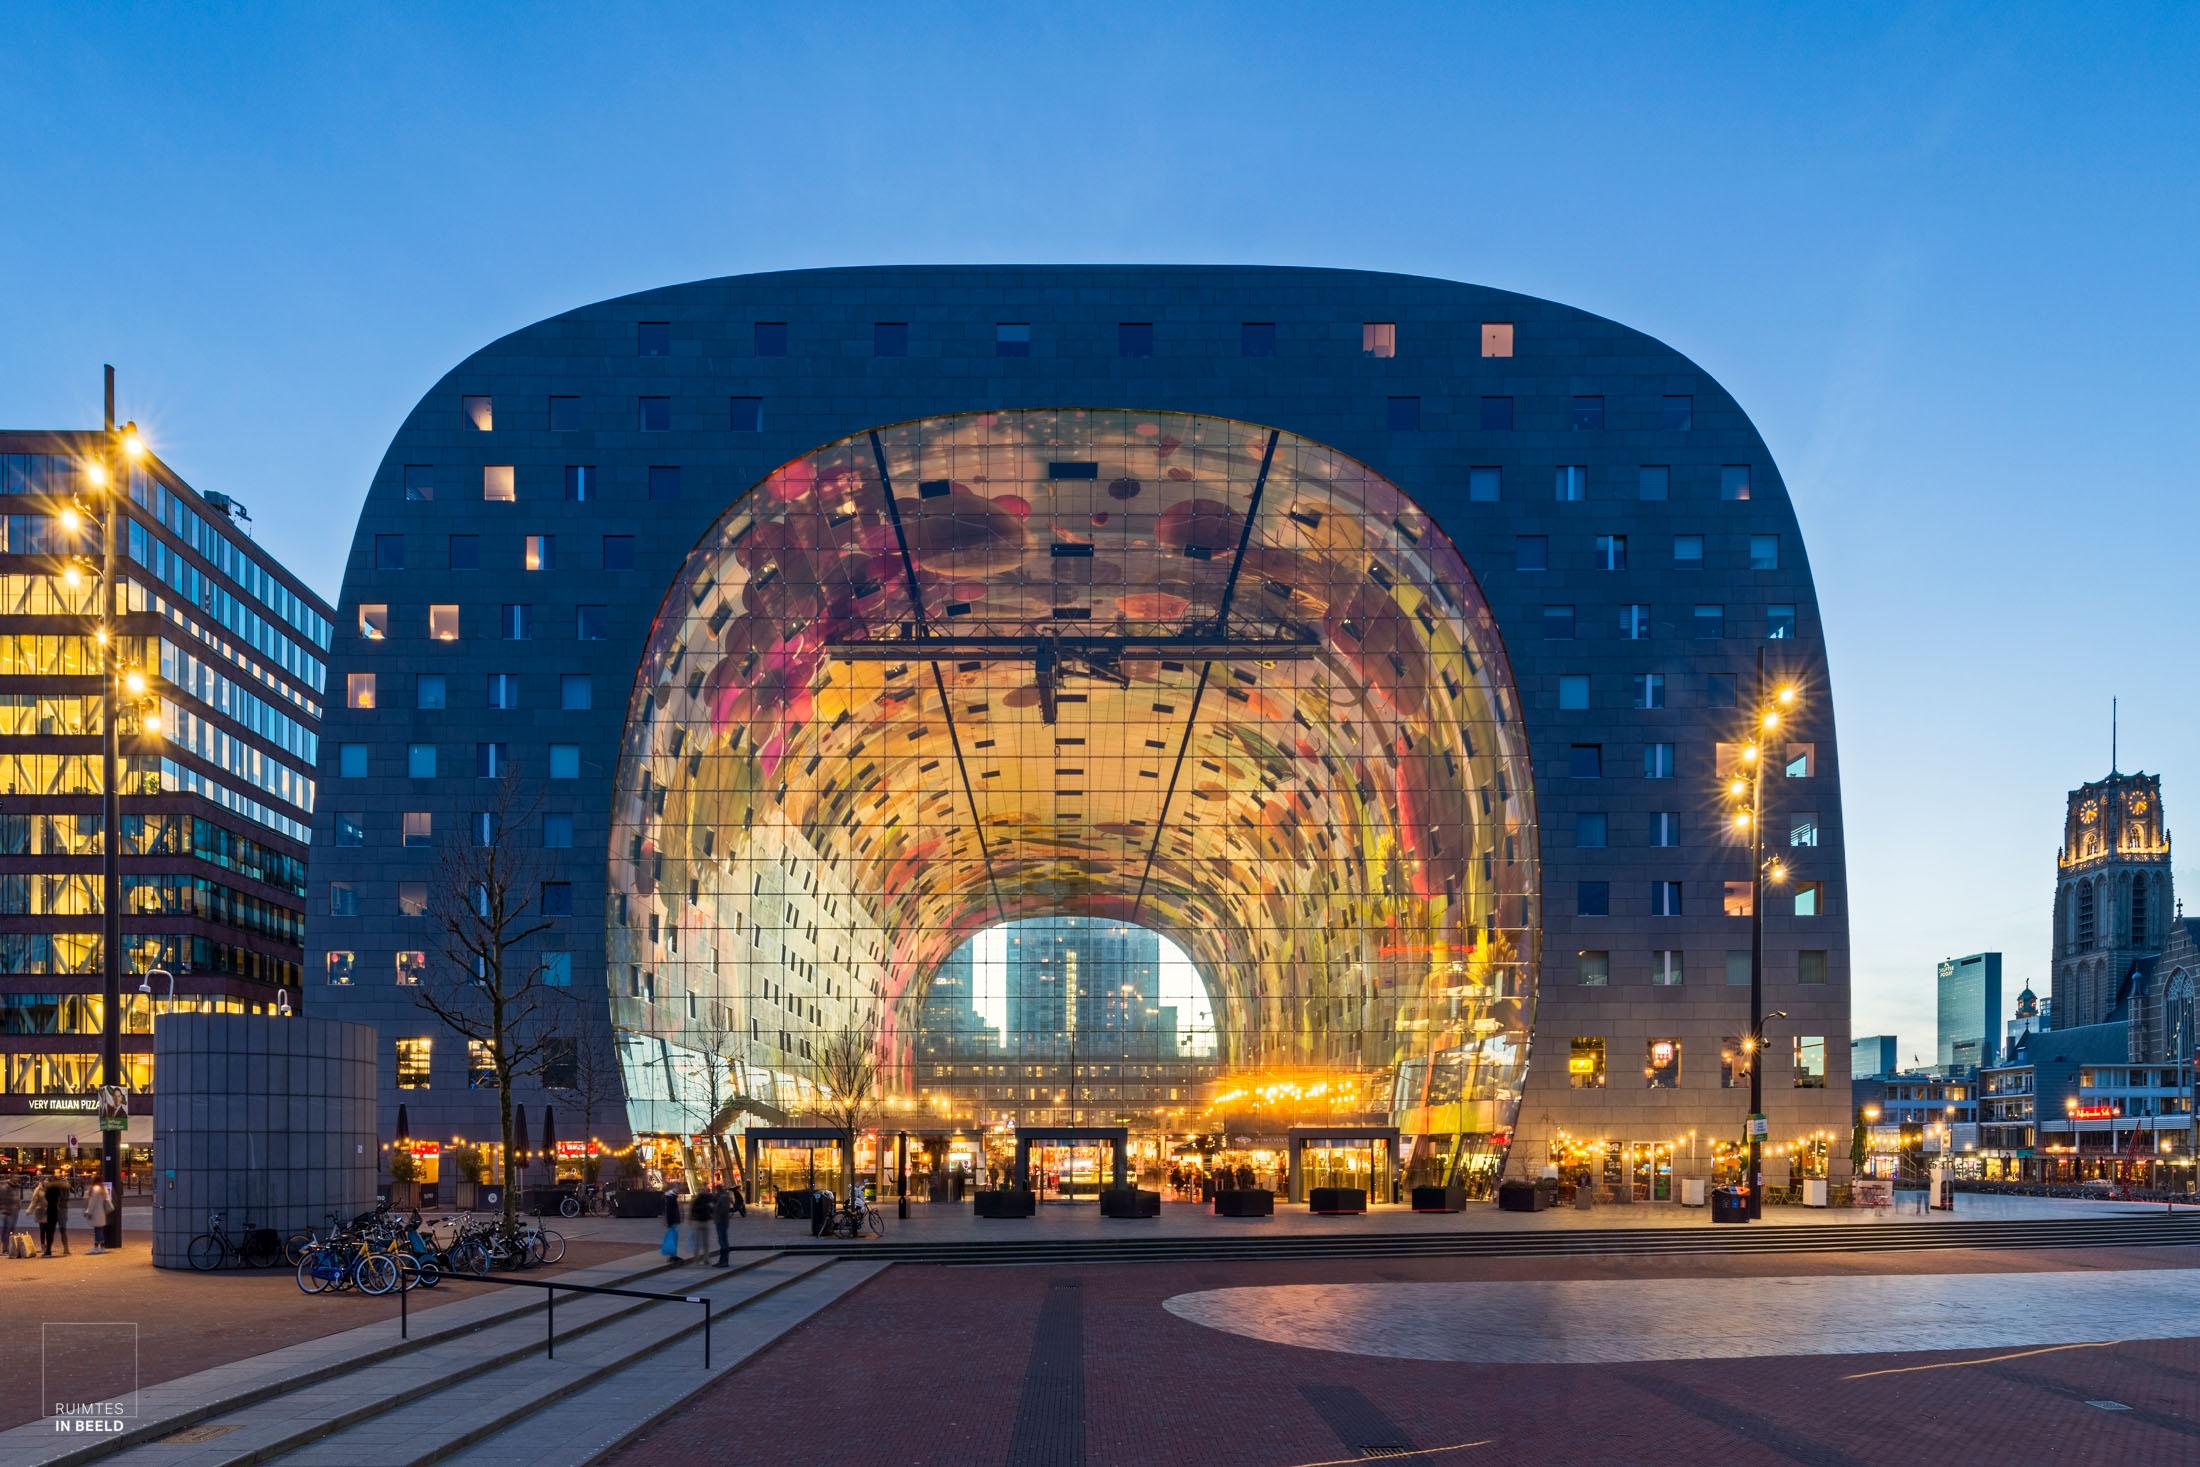 Markthal Rotterdam bij zonsondergang| Market hall, Rotterdam Netherlands, at sunset